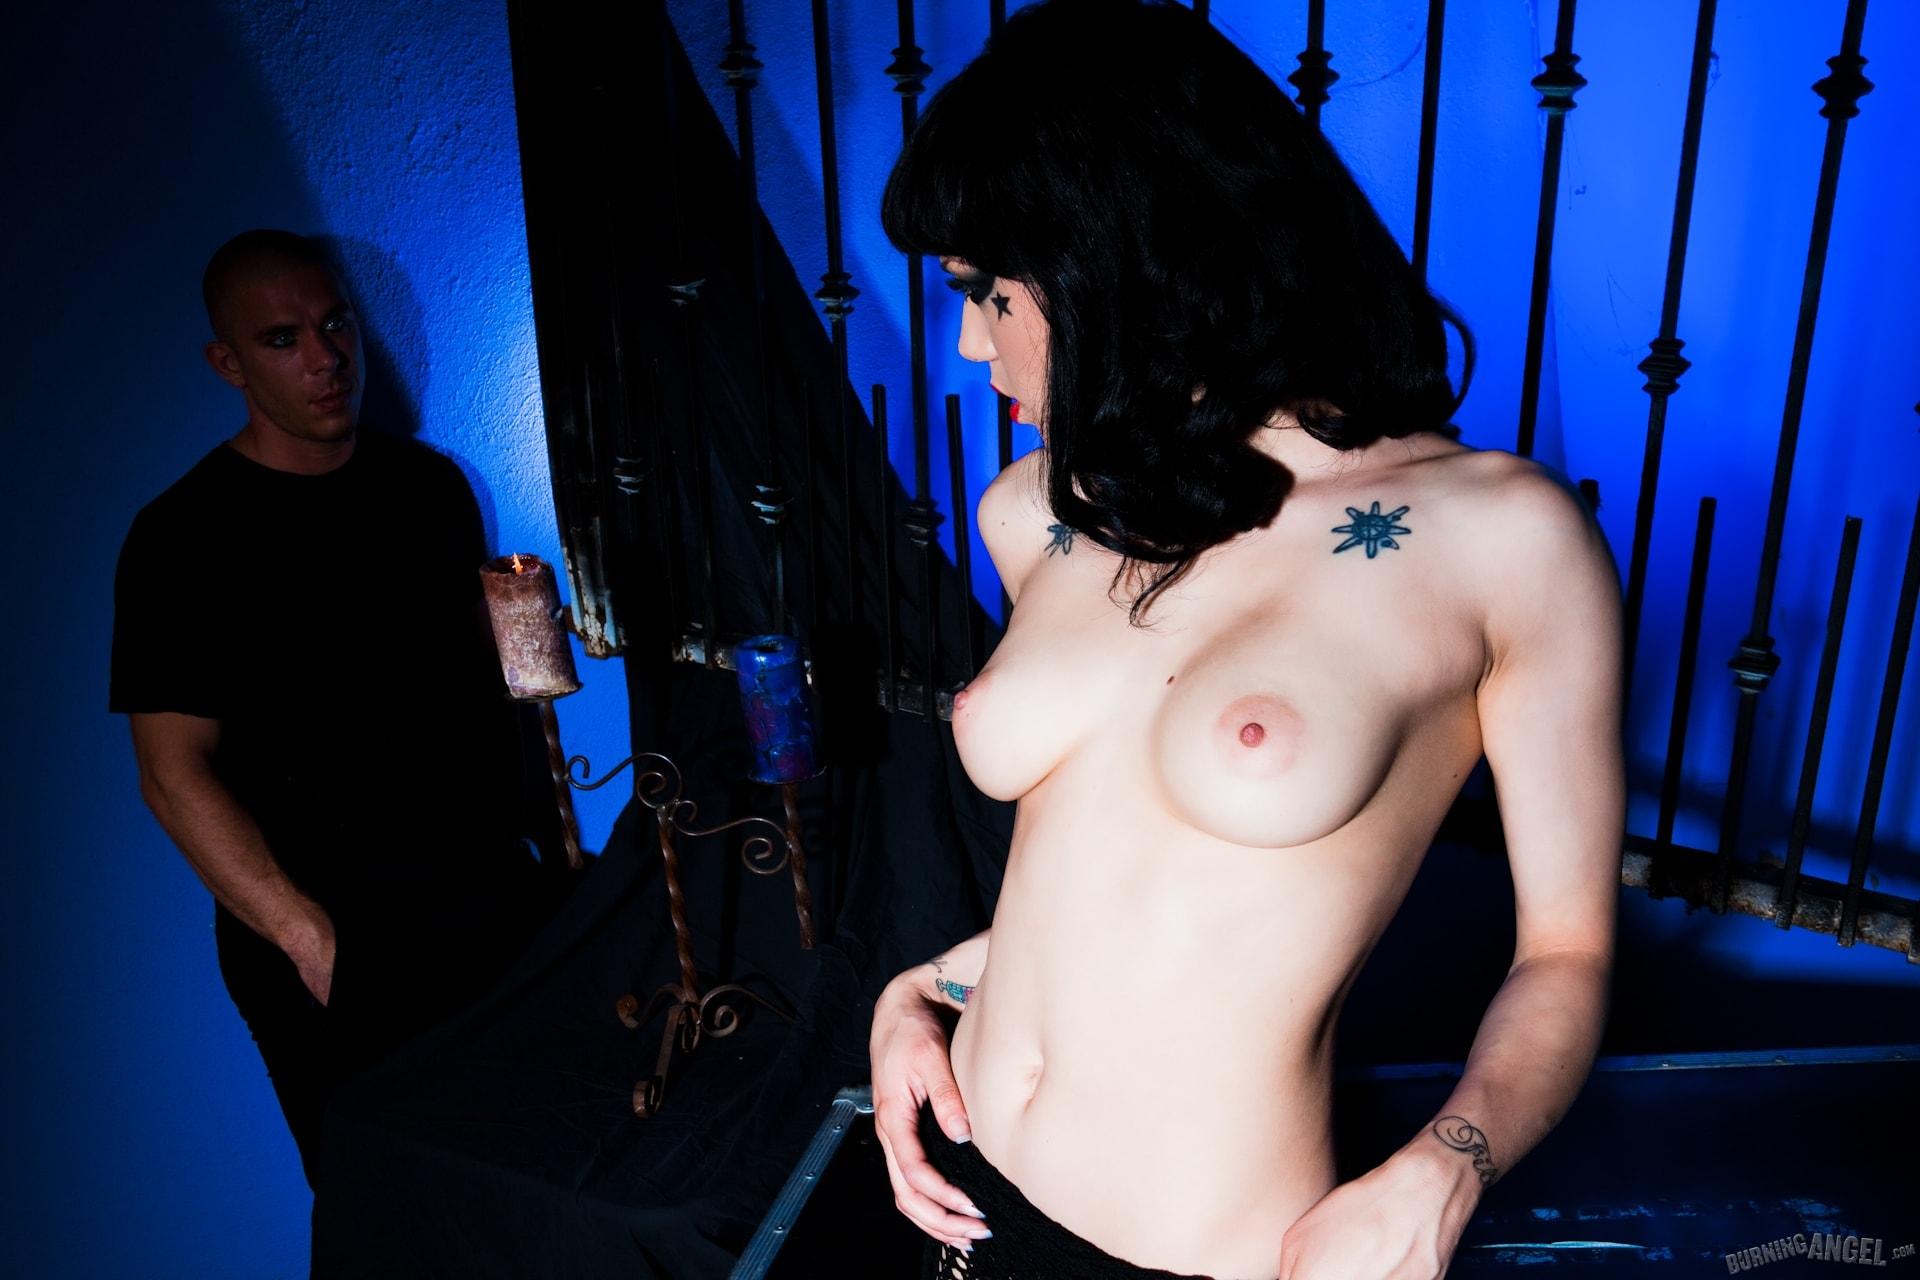 Burning Angel 'Gothic Princess' starring Asphyxia Noir (Photo 2)